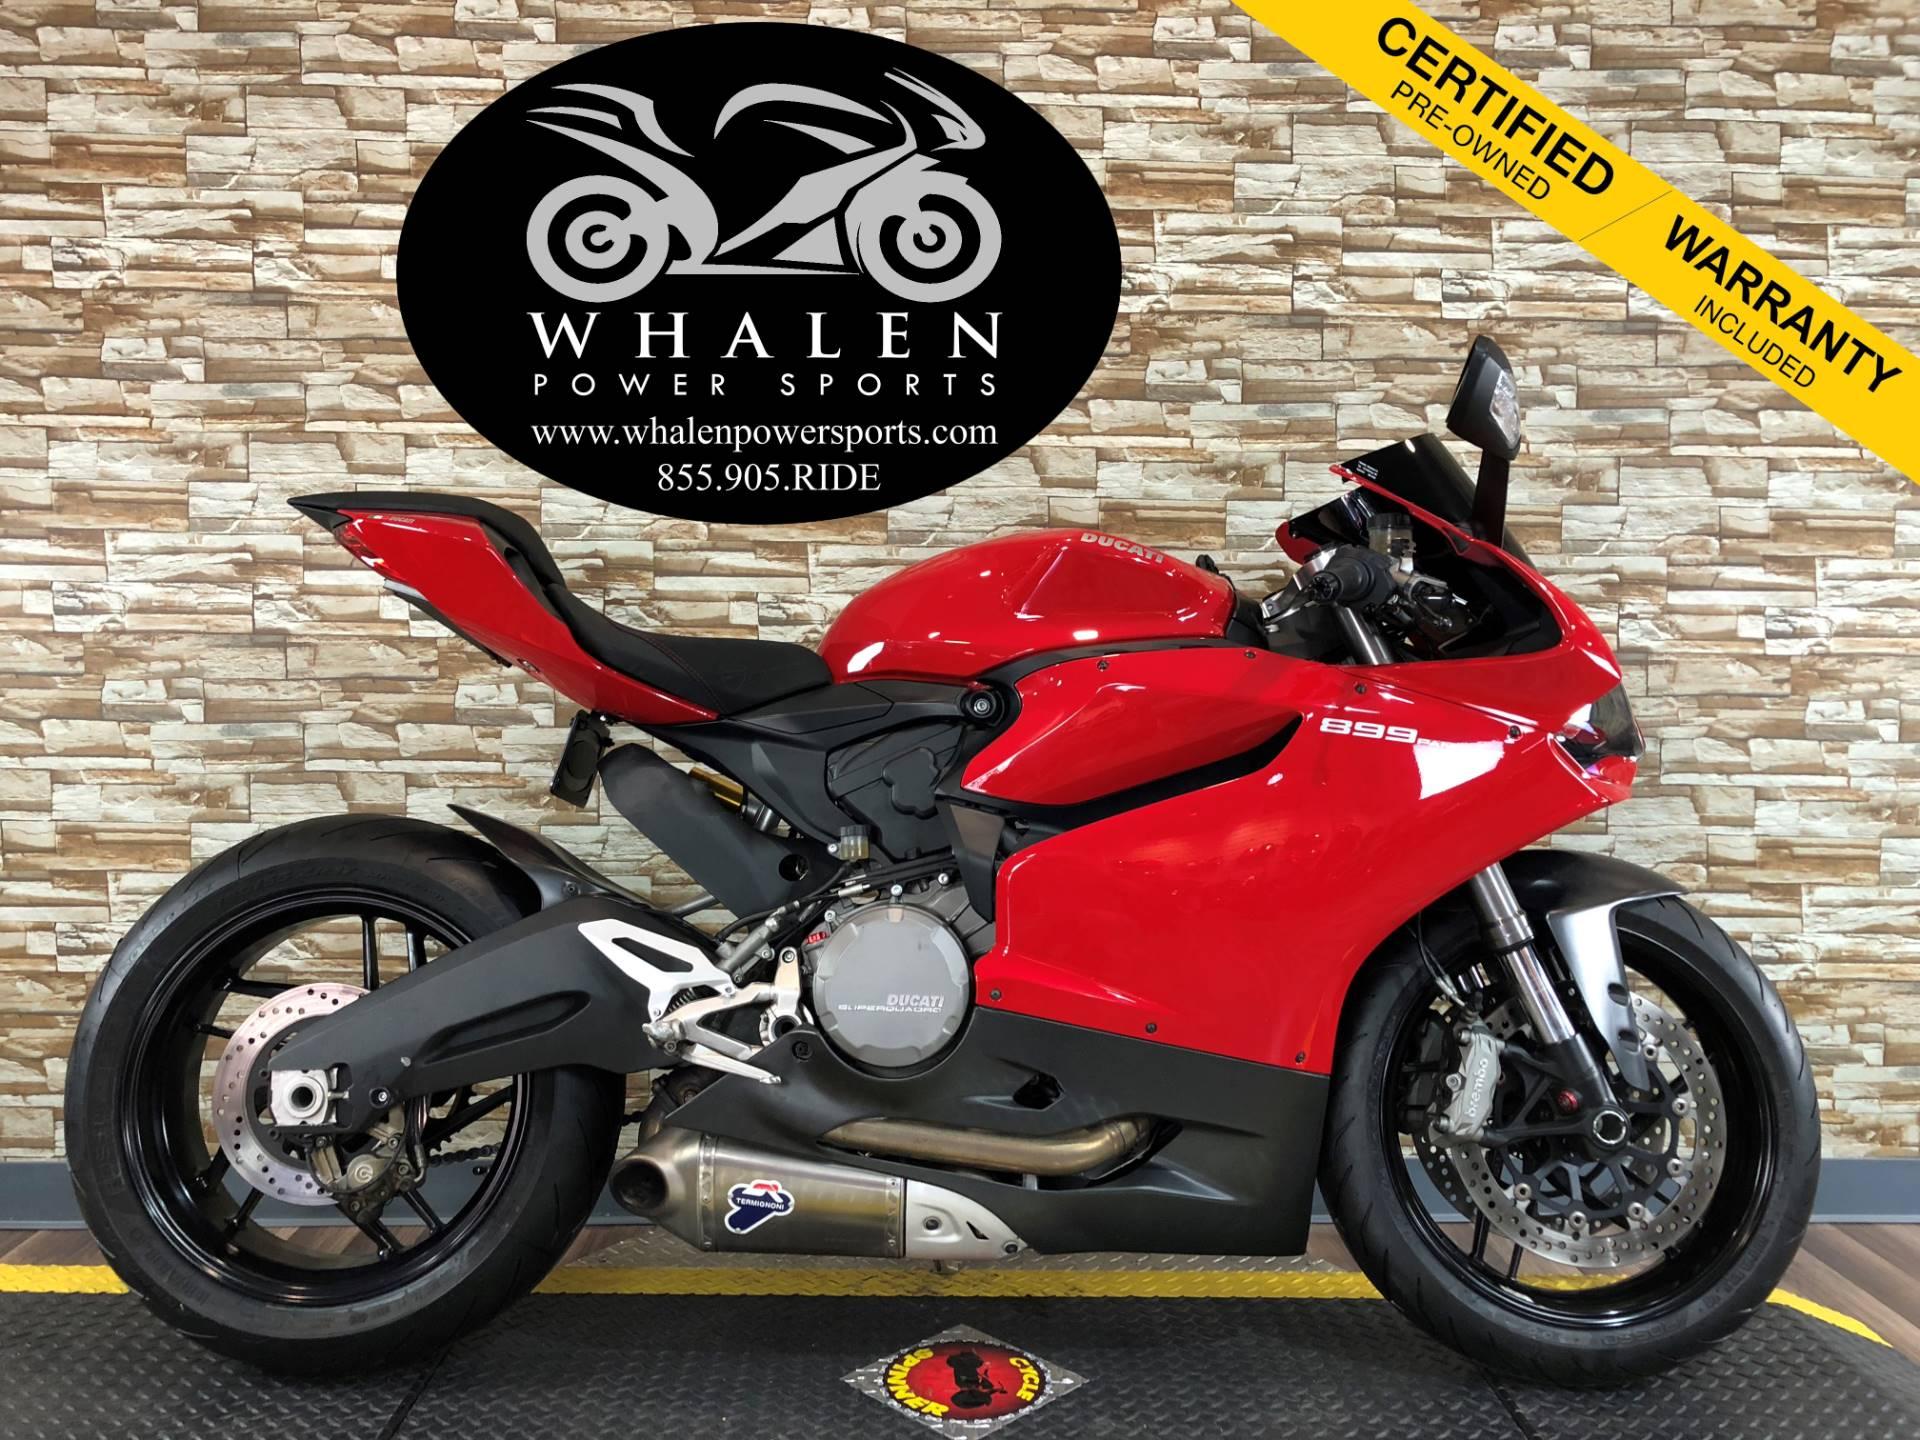 2014 Ducati Superbike 899 Panigale 1